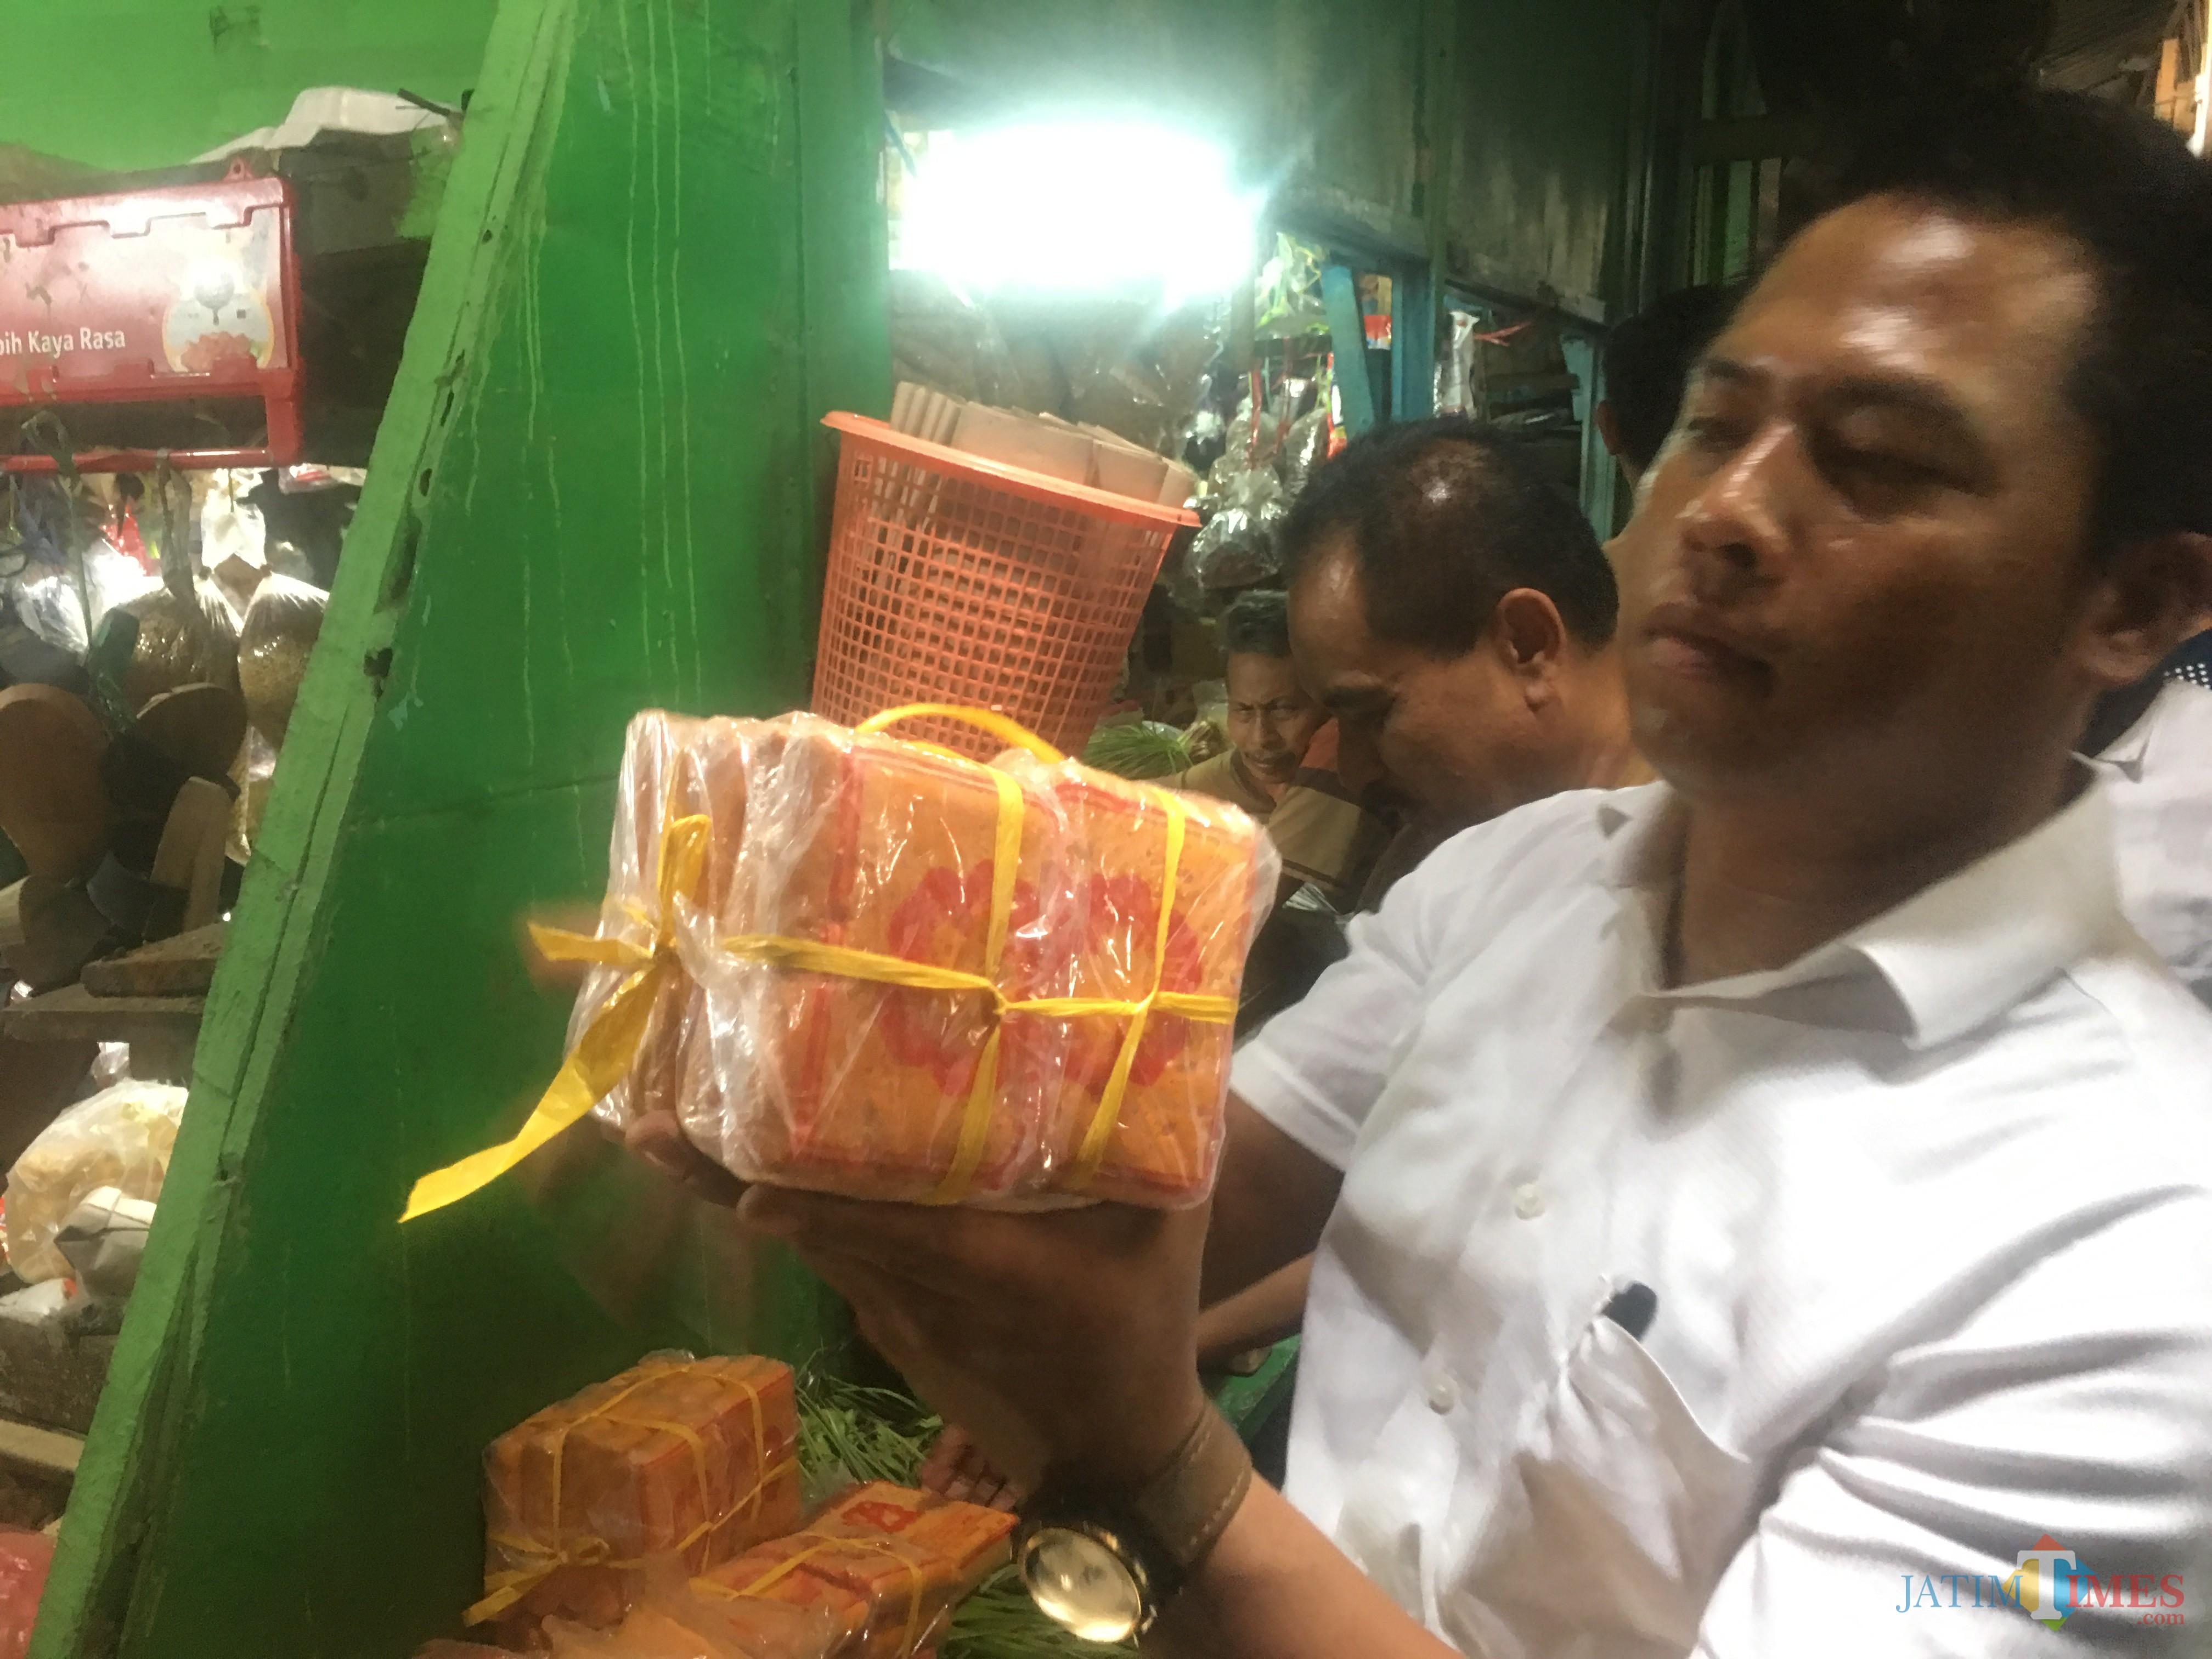 Petugas gabungan Tim Satgas Pangan Kabupaten Malang saat melakukan sidak di Pasar Lawang, Kabupaten Malang (Foto : Ashaq Lupito / MalangTIMES)